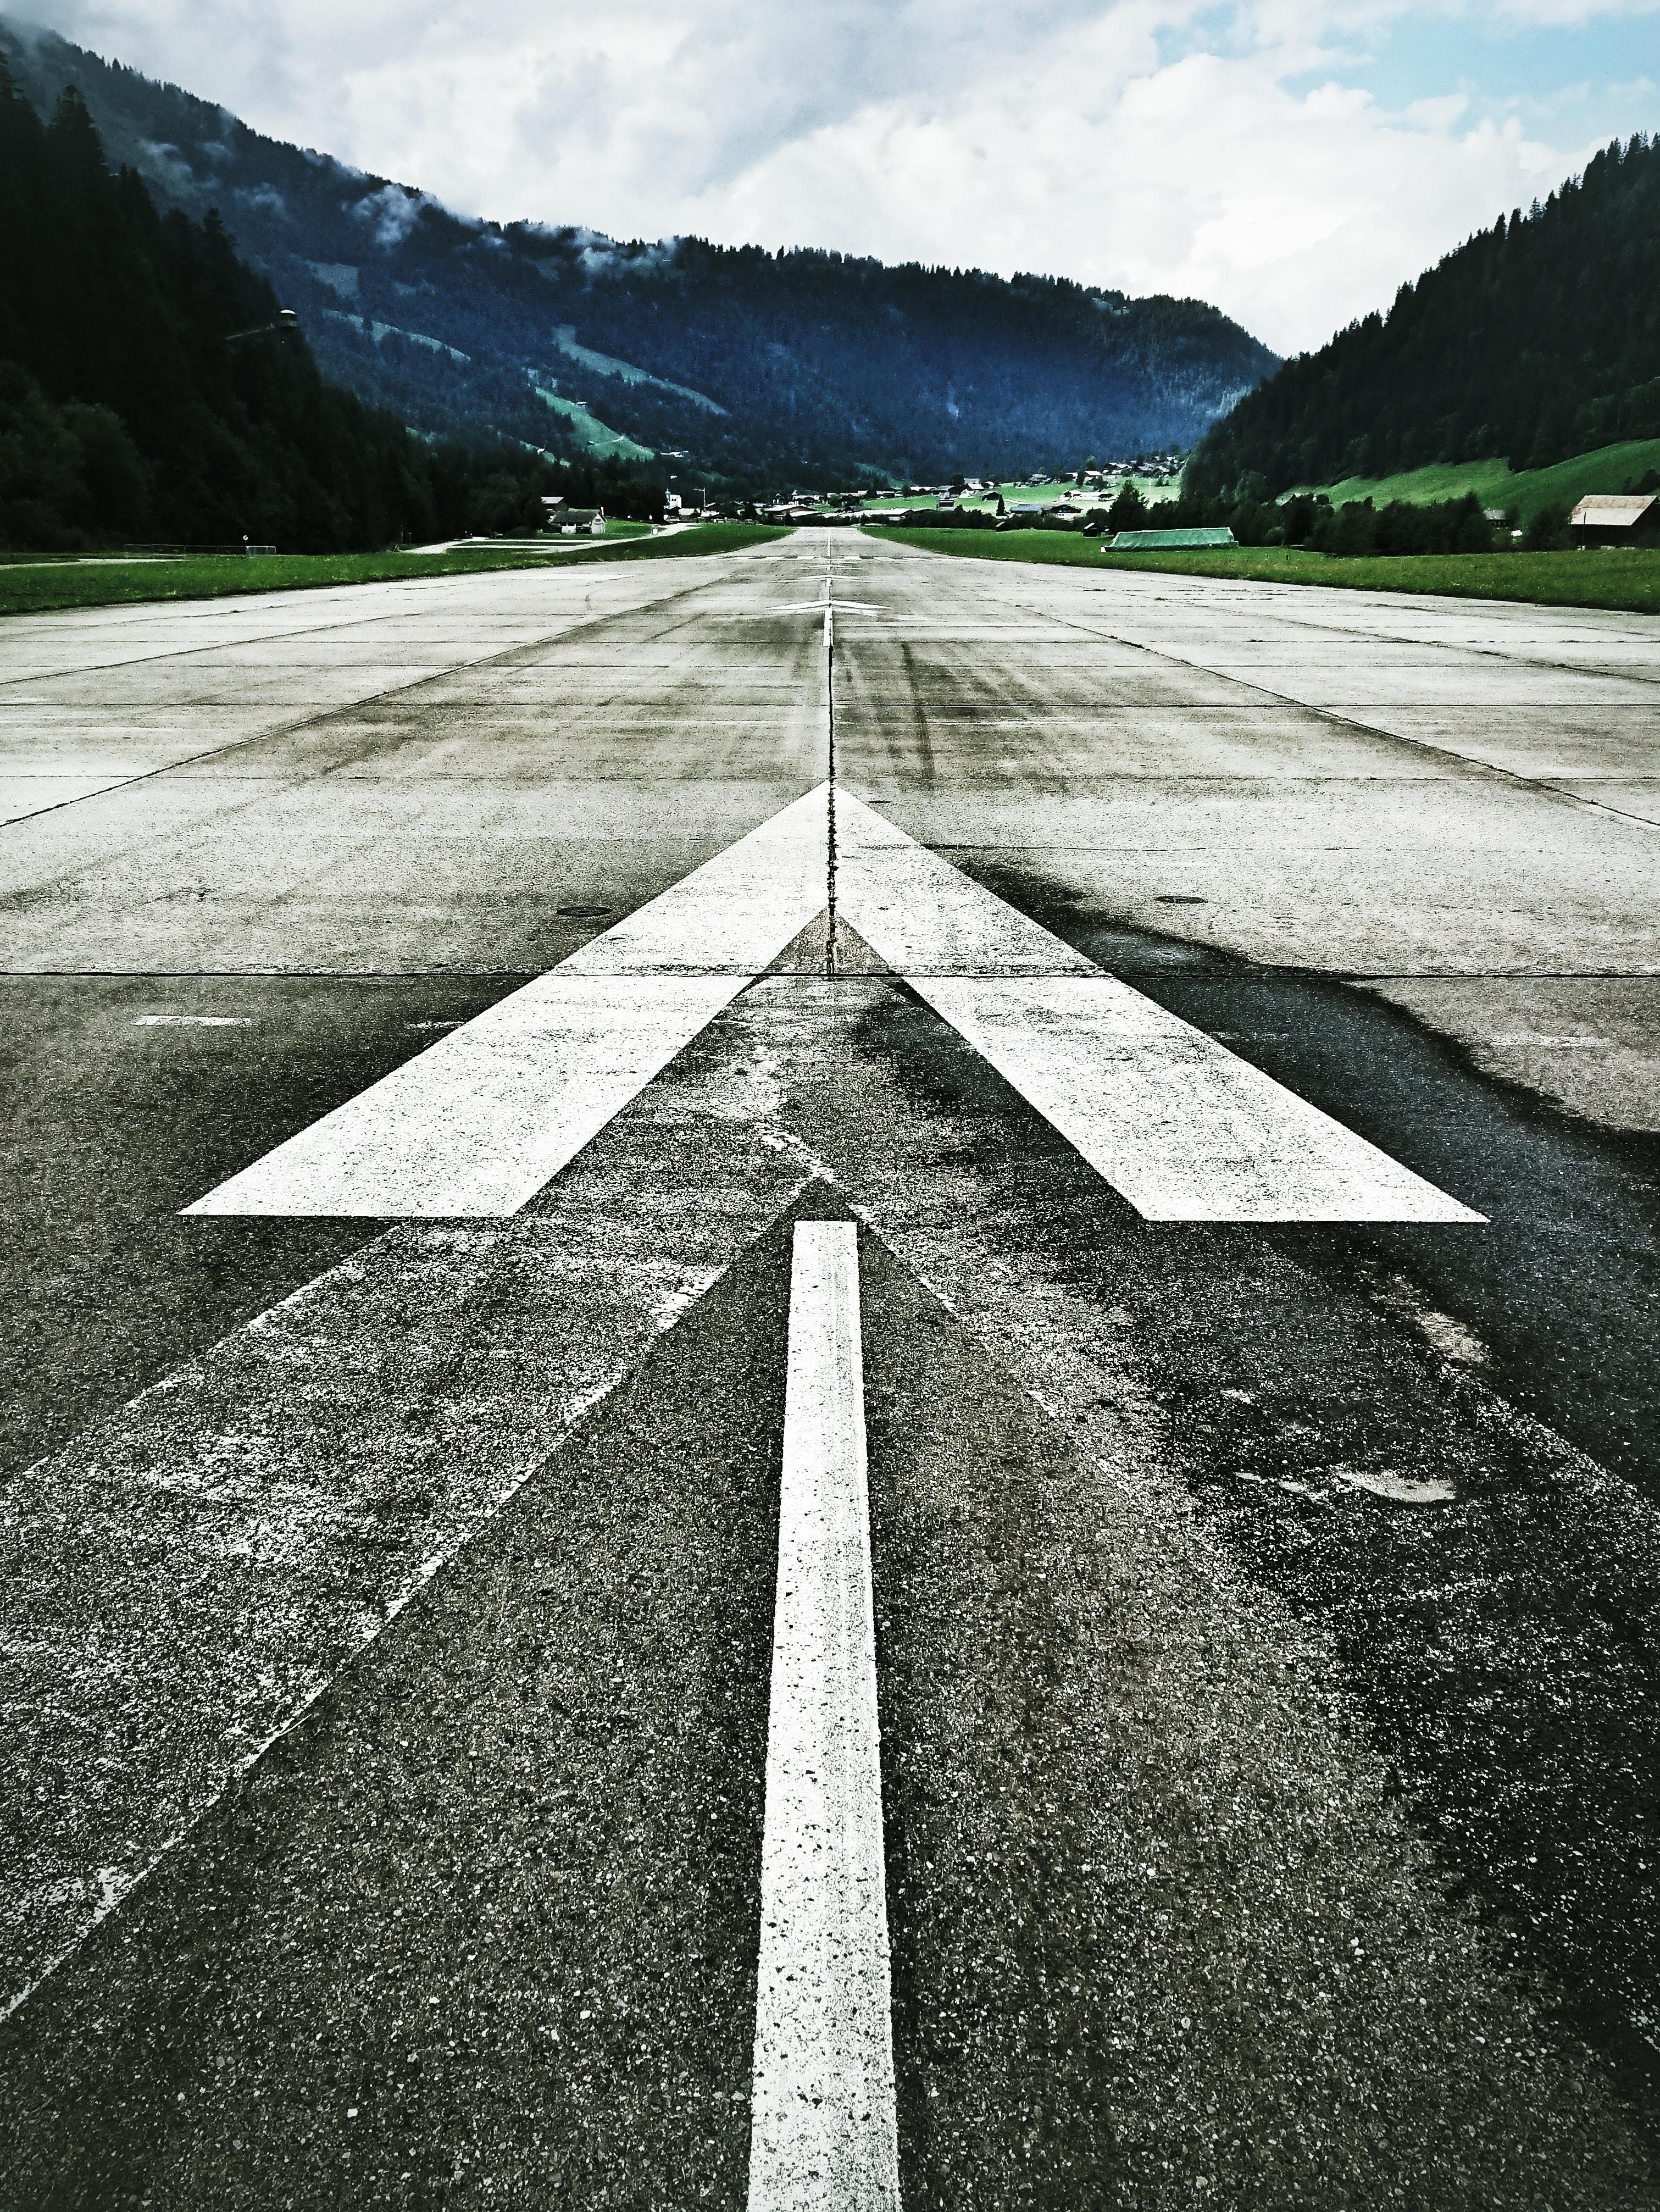 Walk This Way: Flugfeld bei Matten, Bern. Foto: Jan Graber, 2018.